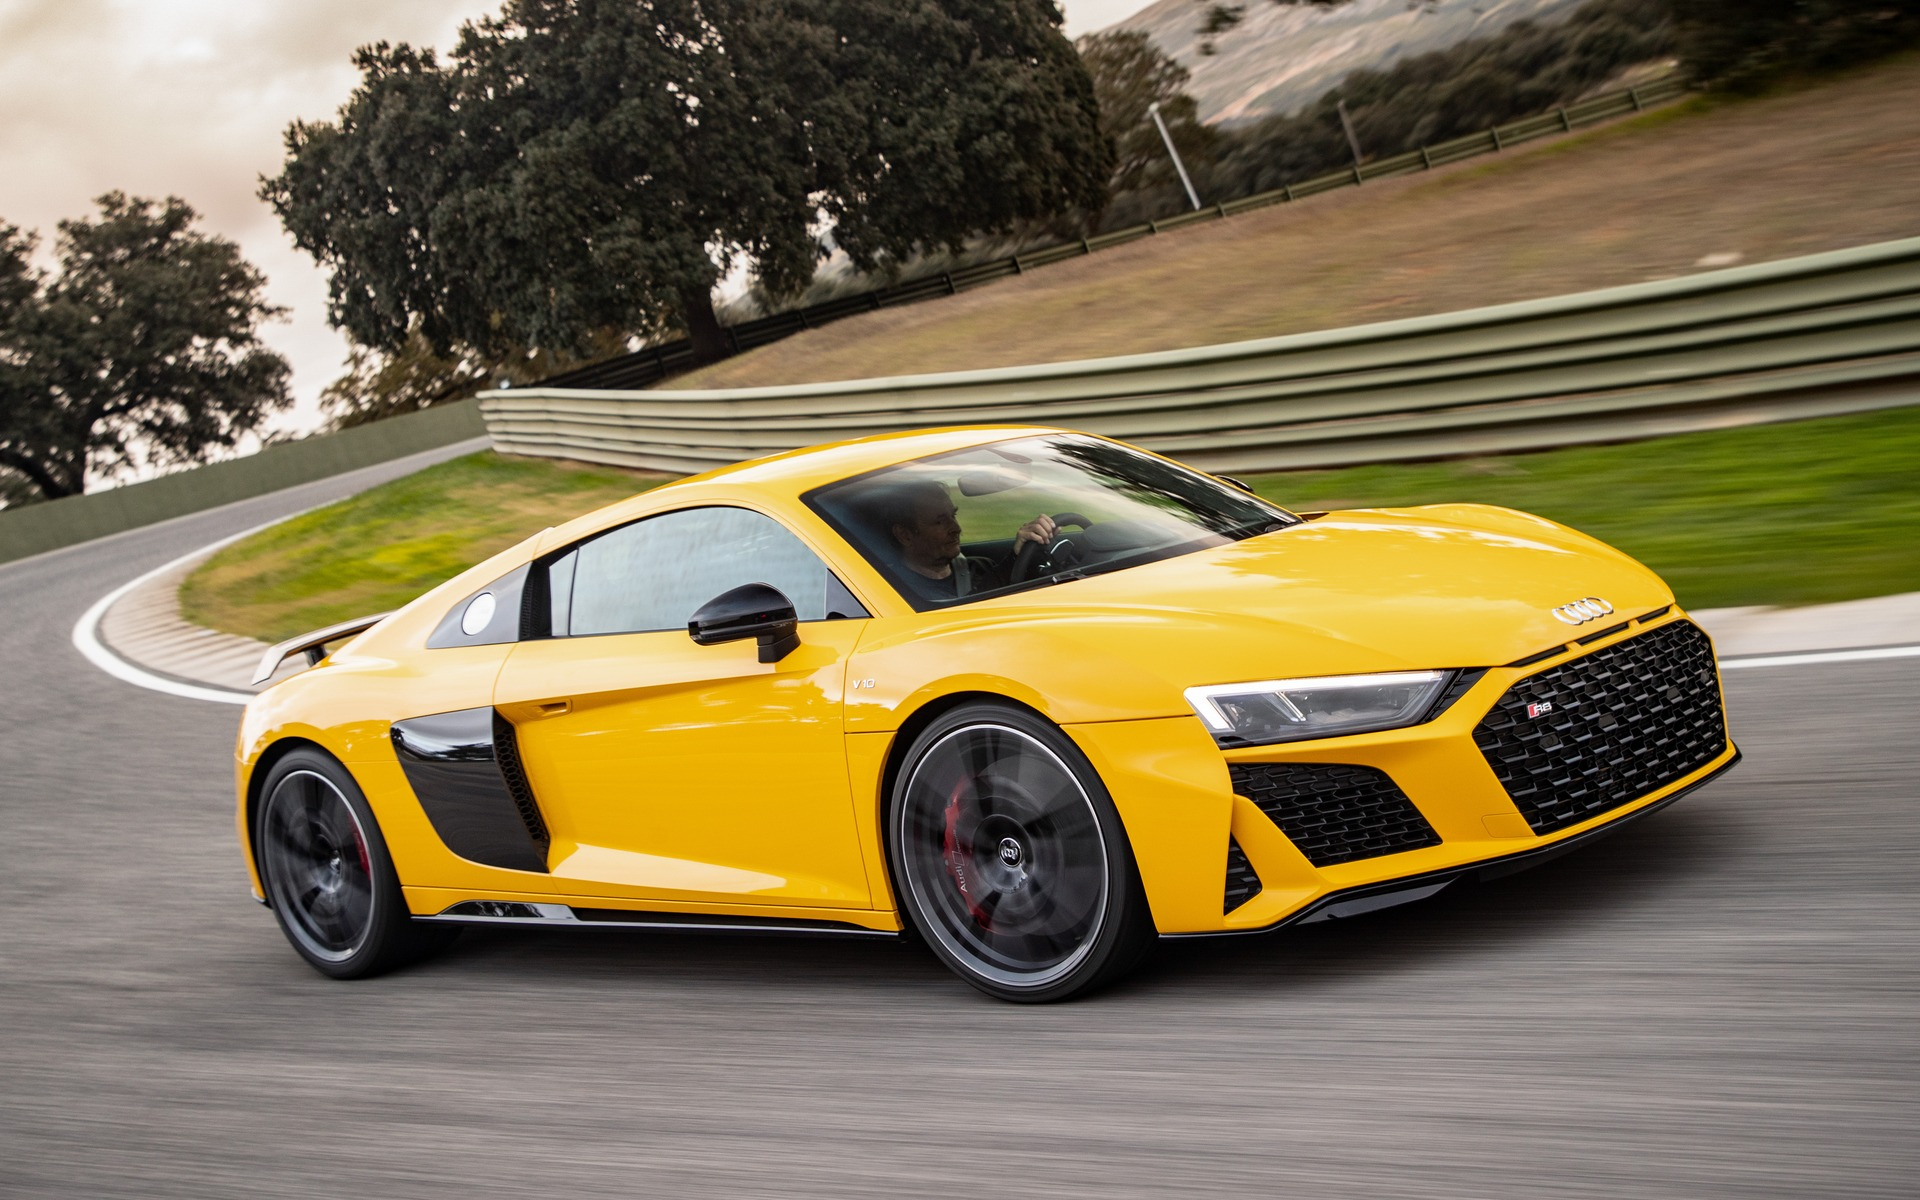 Audi R8 V10 performance quattro 2020 sur le circuit Ascari